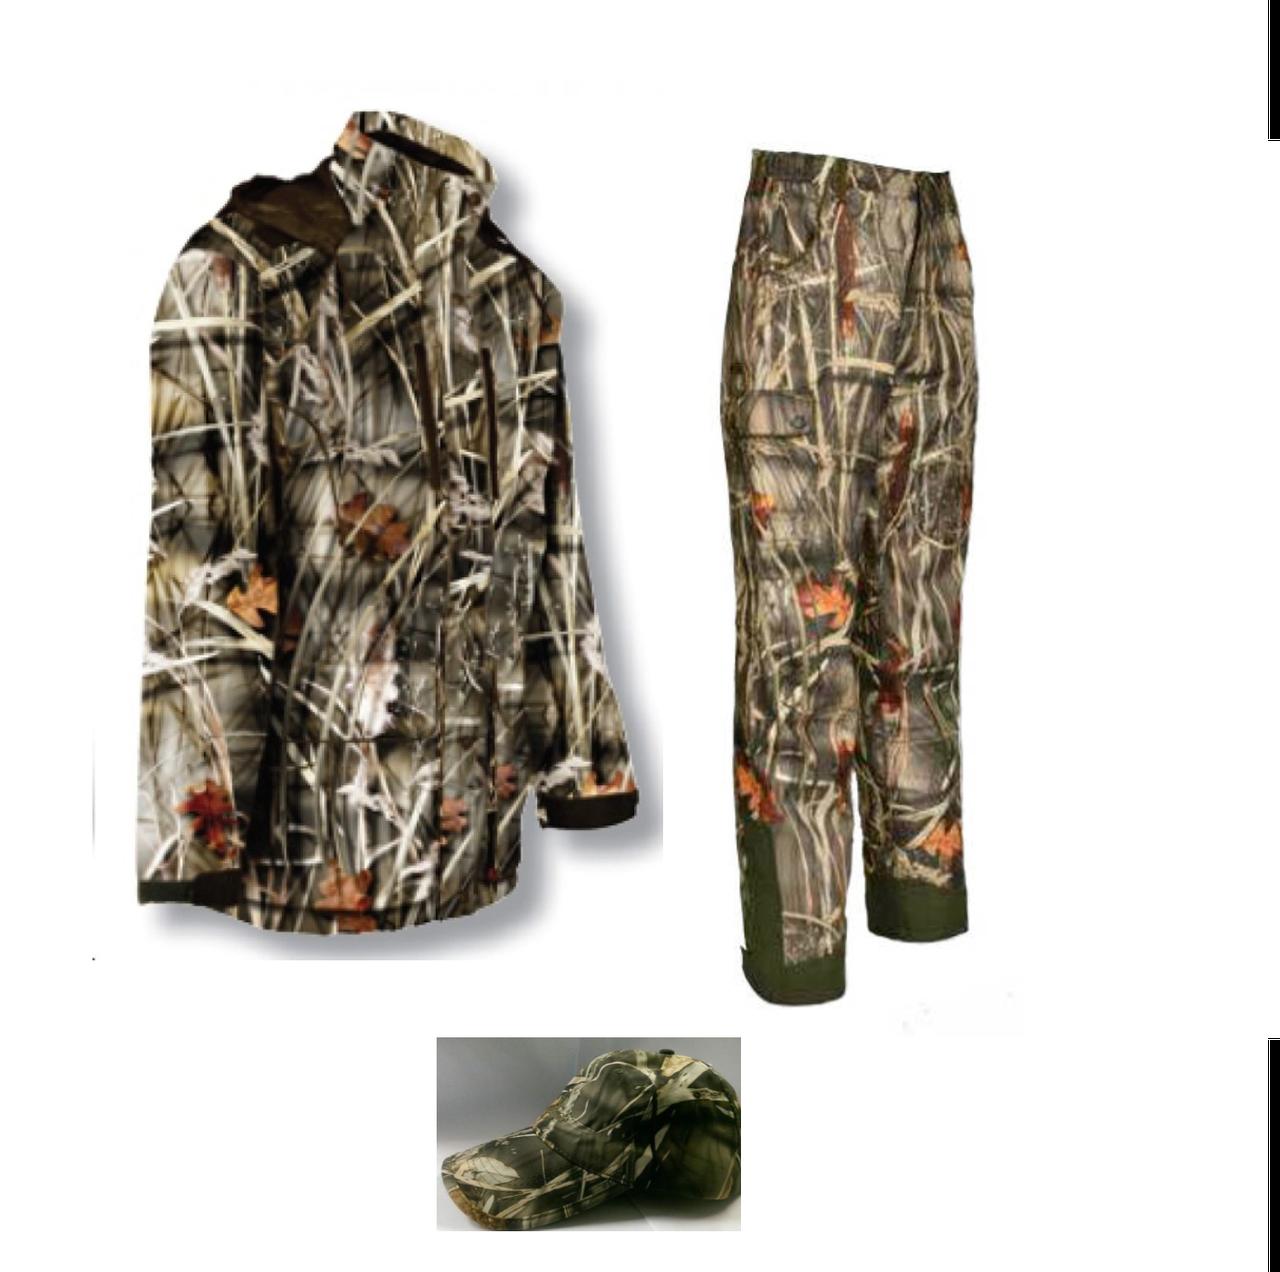 Keen's fishing clothing